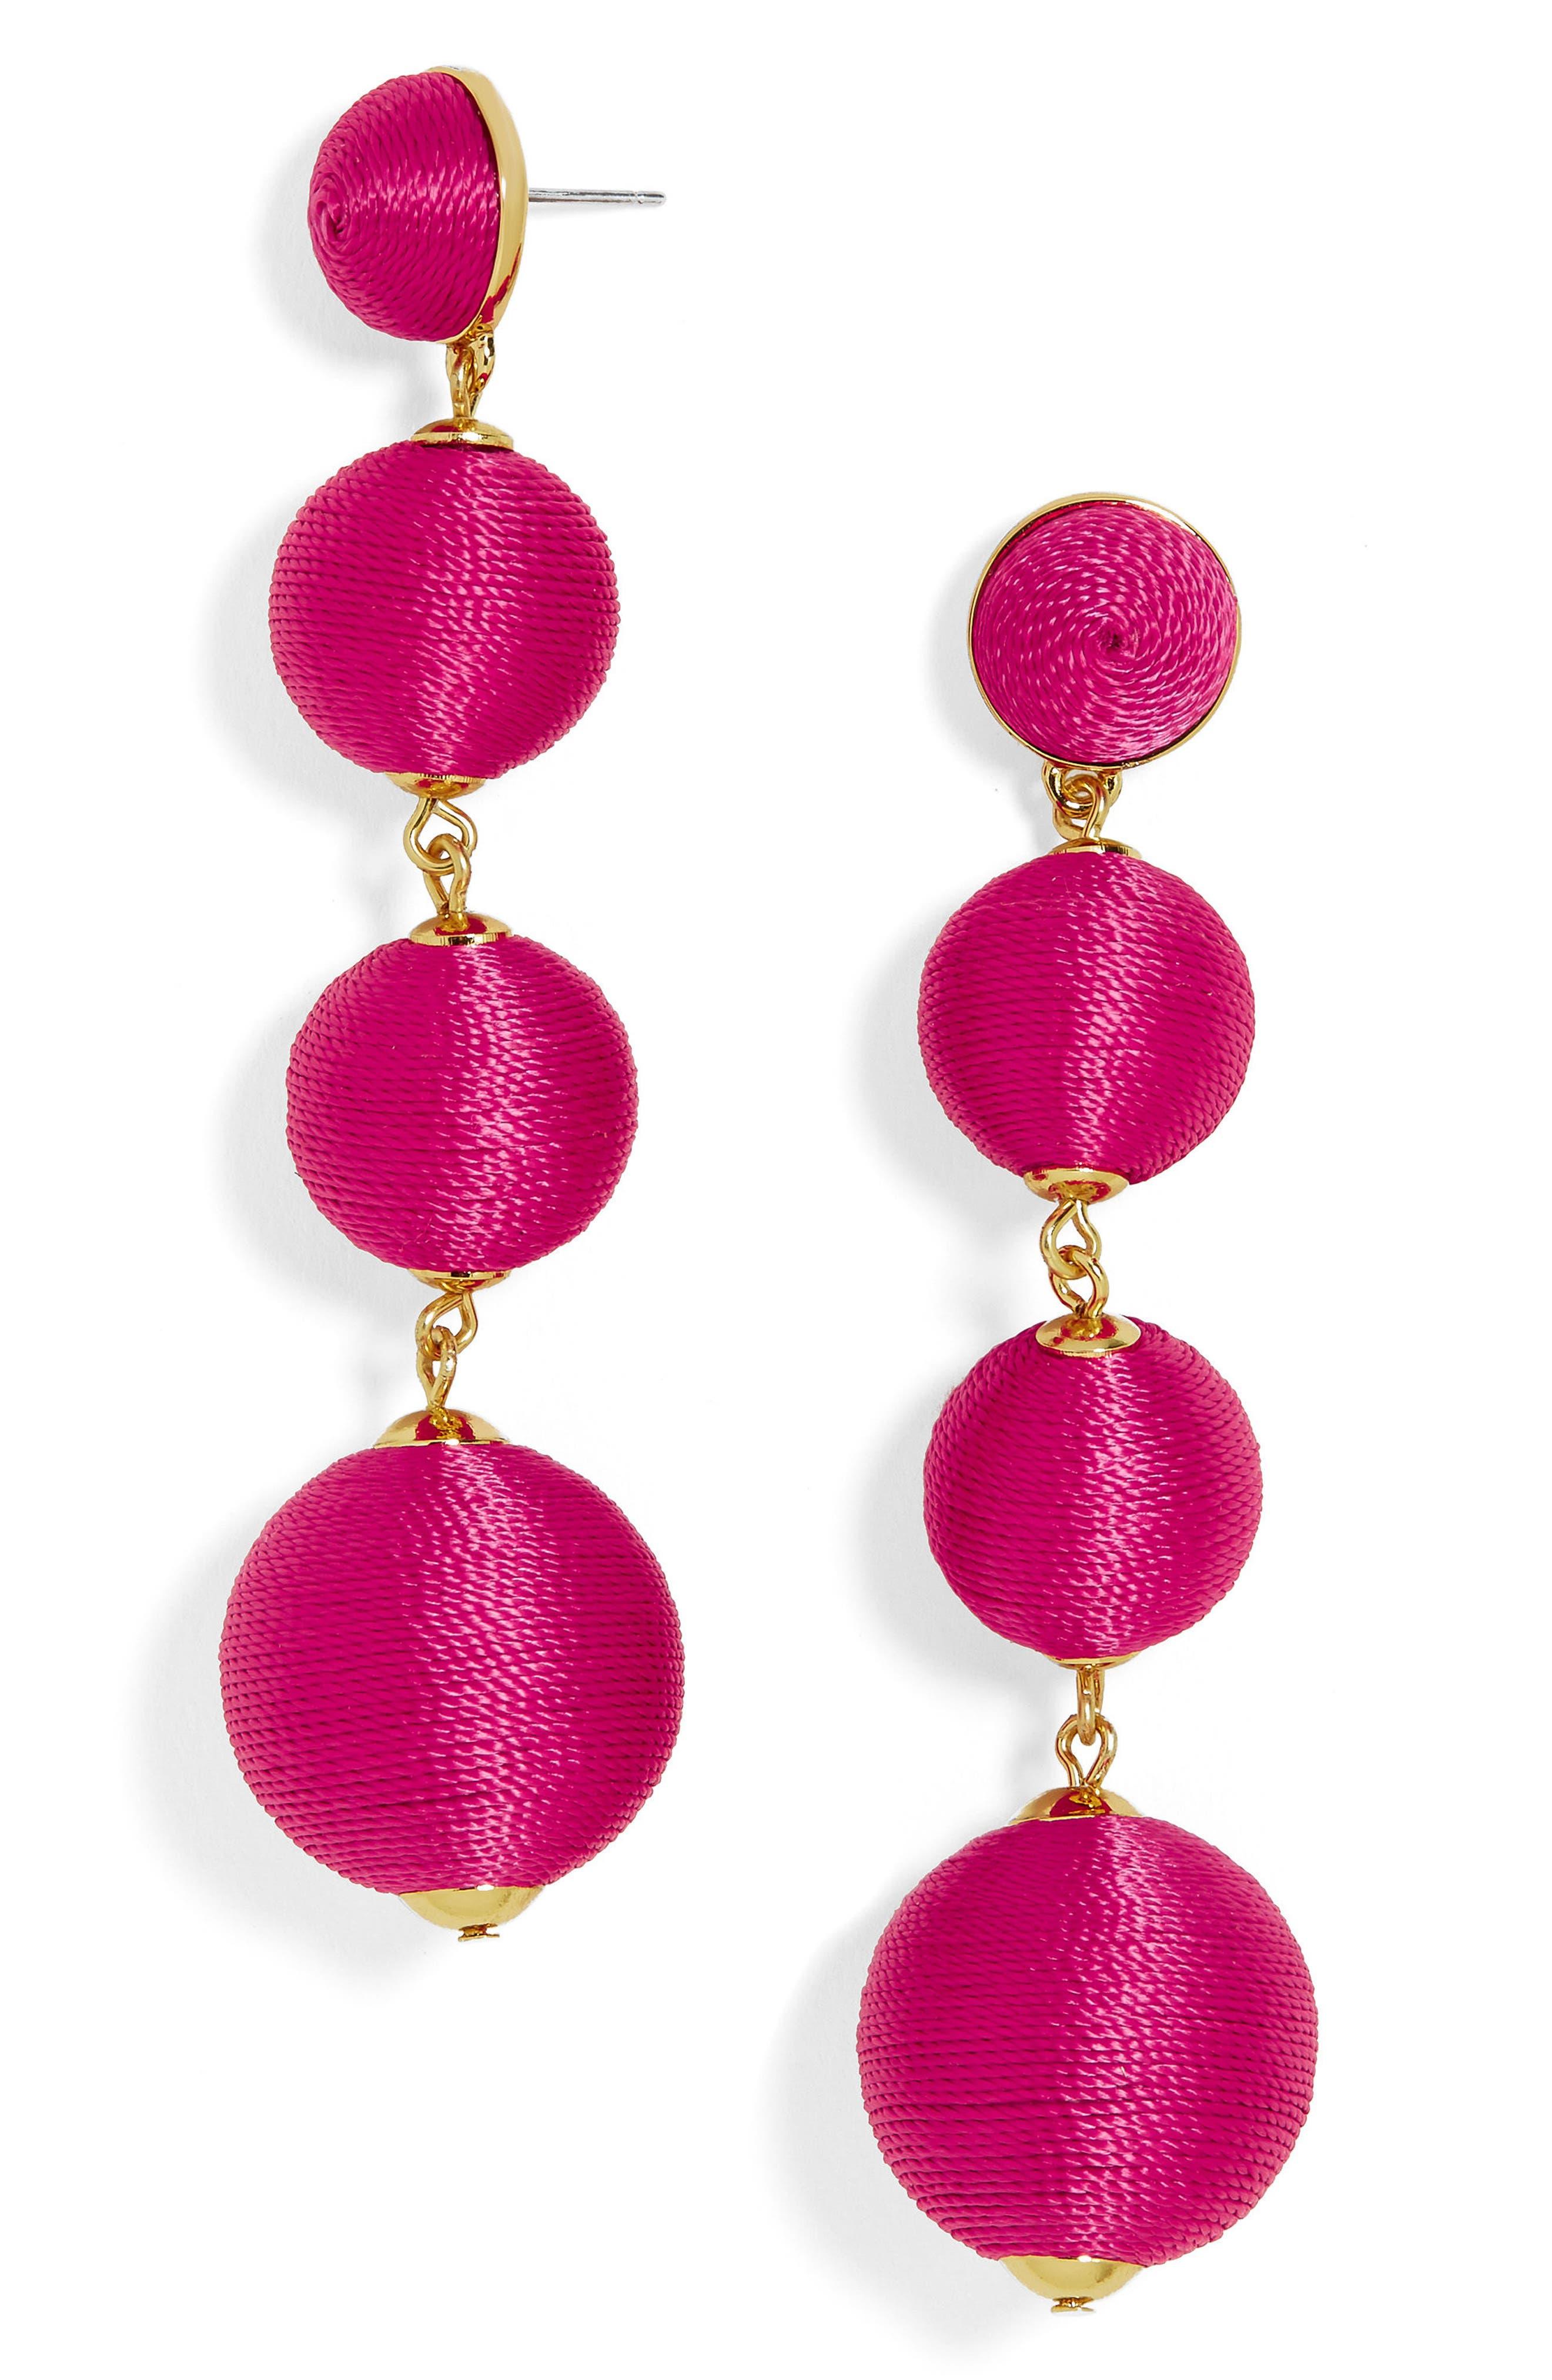 Criselda Ball Shoulder Duster Earrings,                             Main thumbnail 7, color,